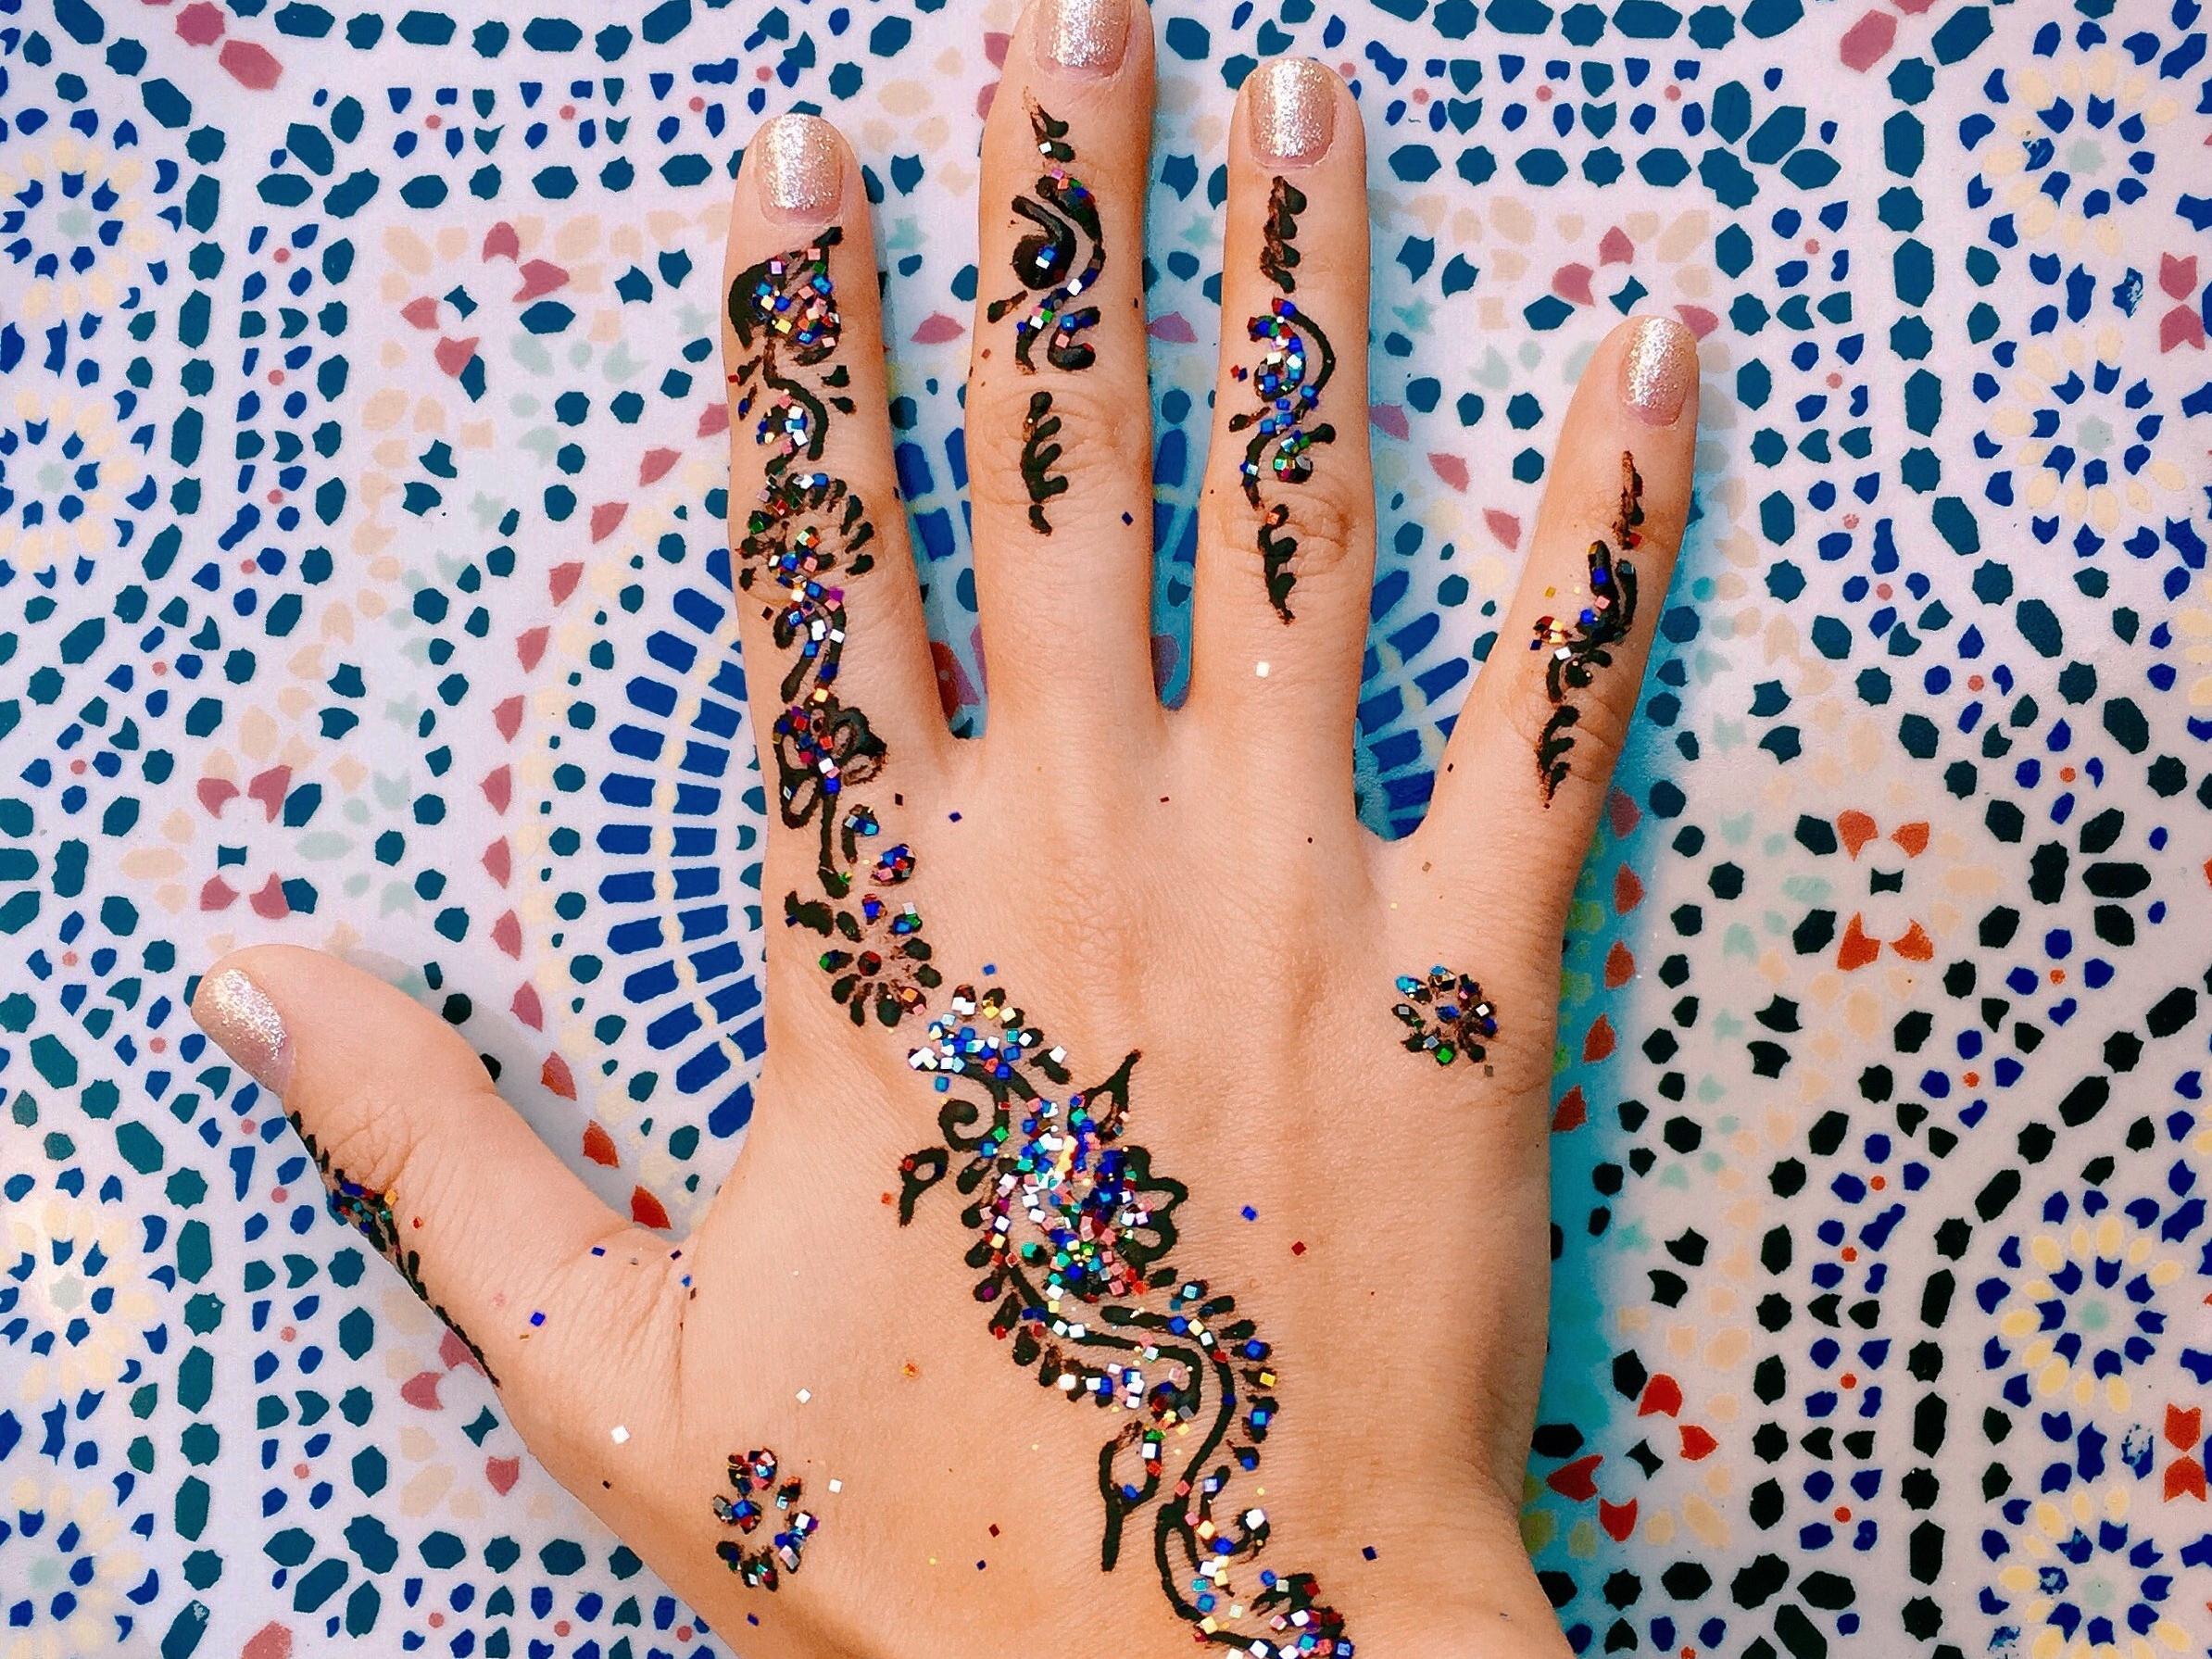 Marrakech_47-e1421277929225.jpg